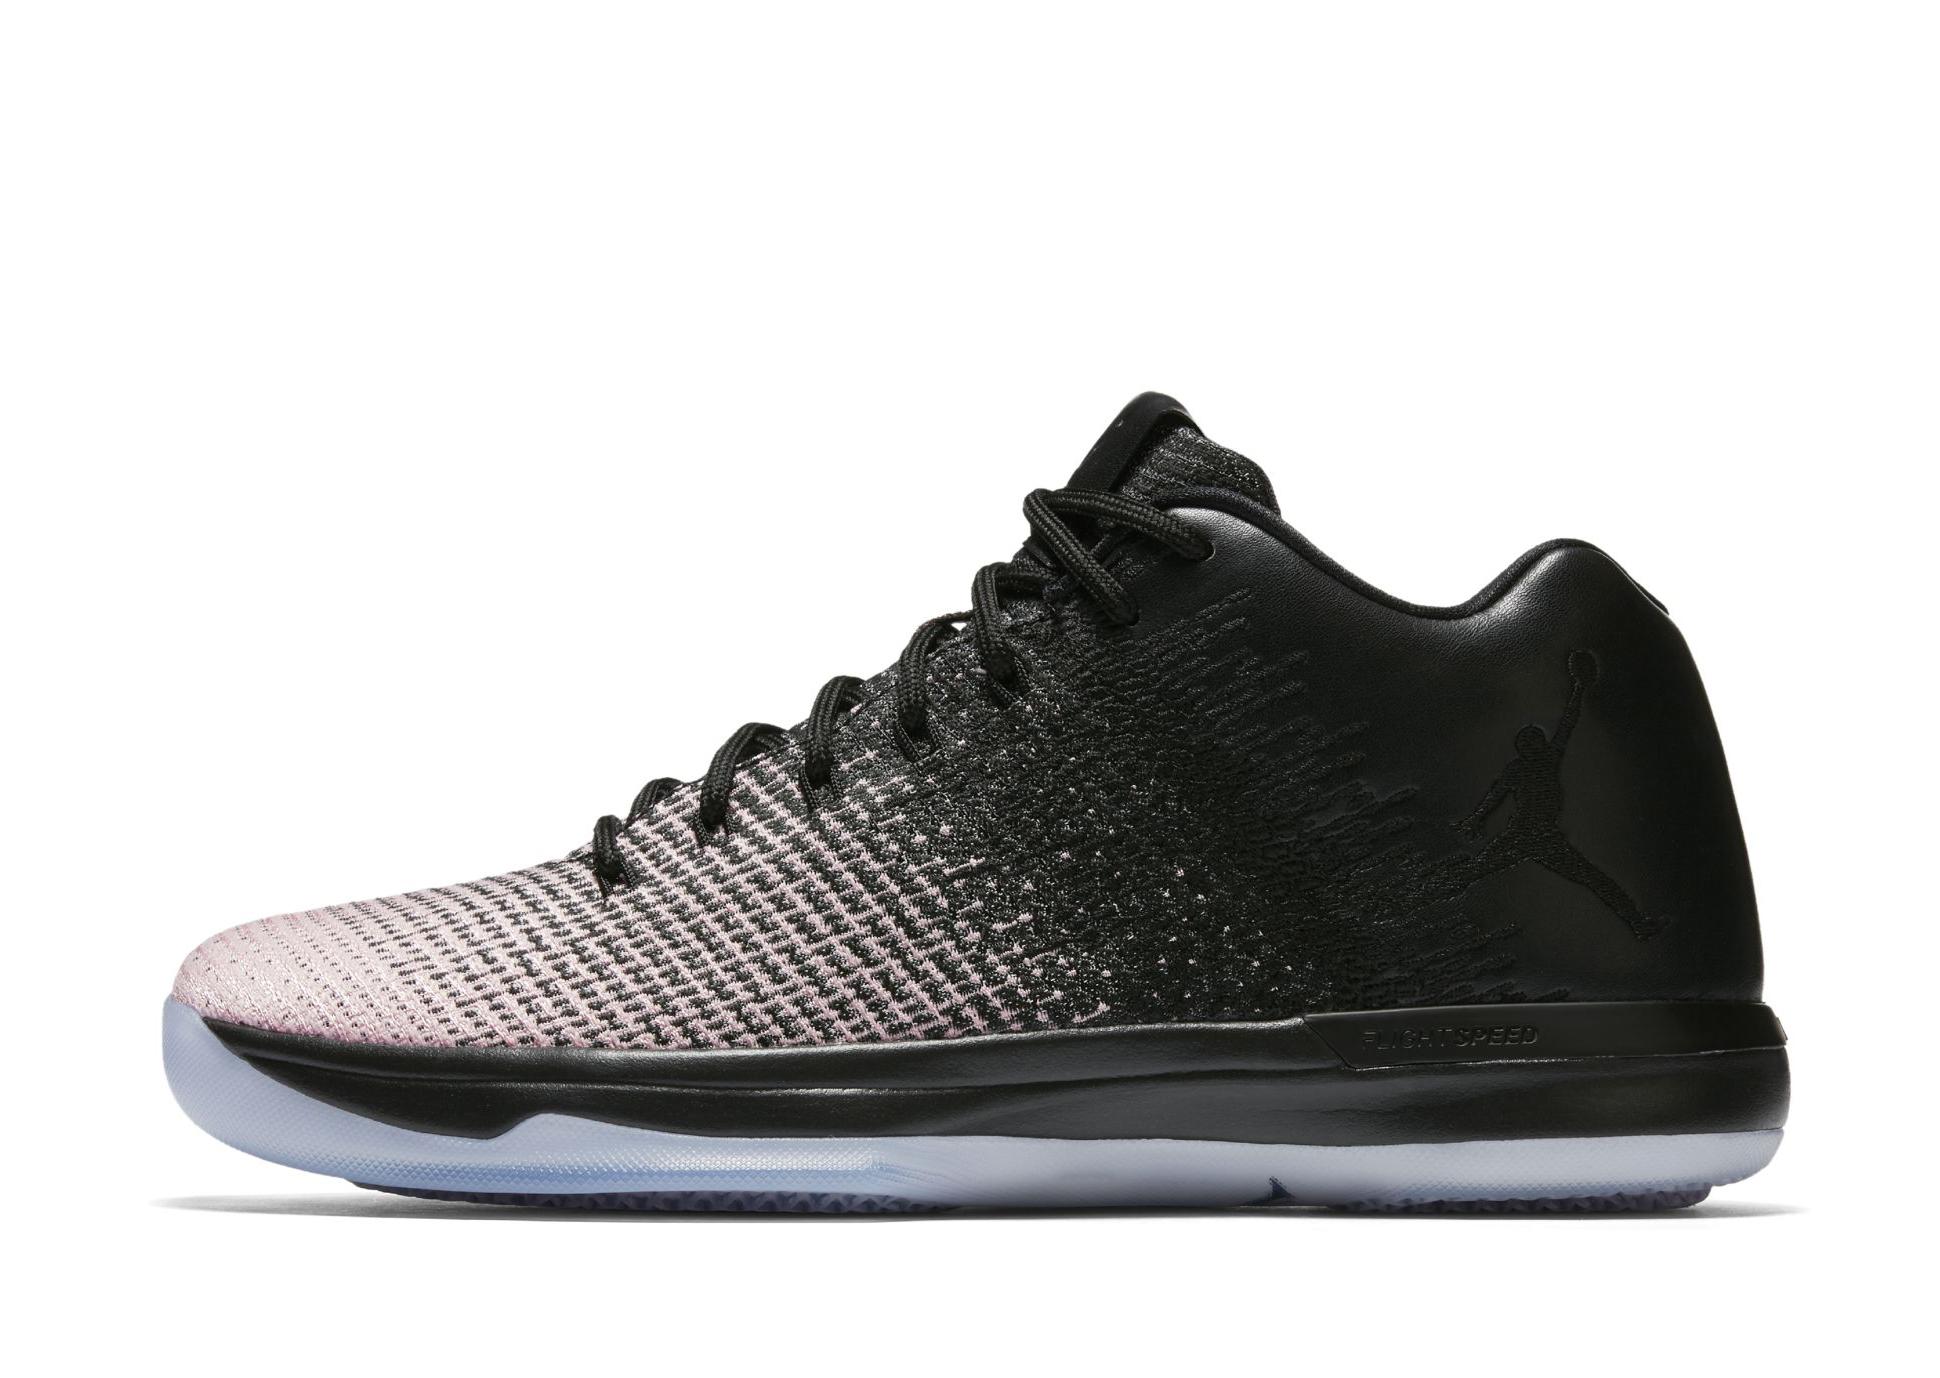 1133b79ed421 ... Air Jordan 31 (XXX1) The colorway looks ideal for San Antonio Spurs  star and Jordan Brand athlete Kawhi Leonard.